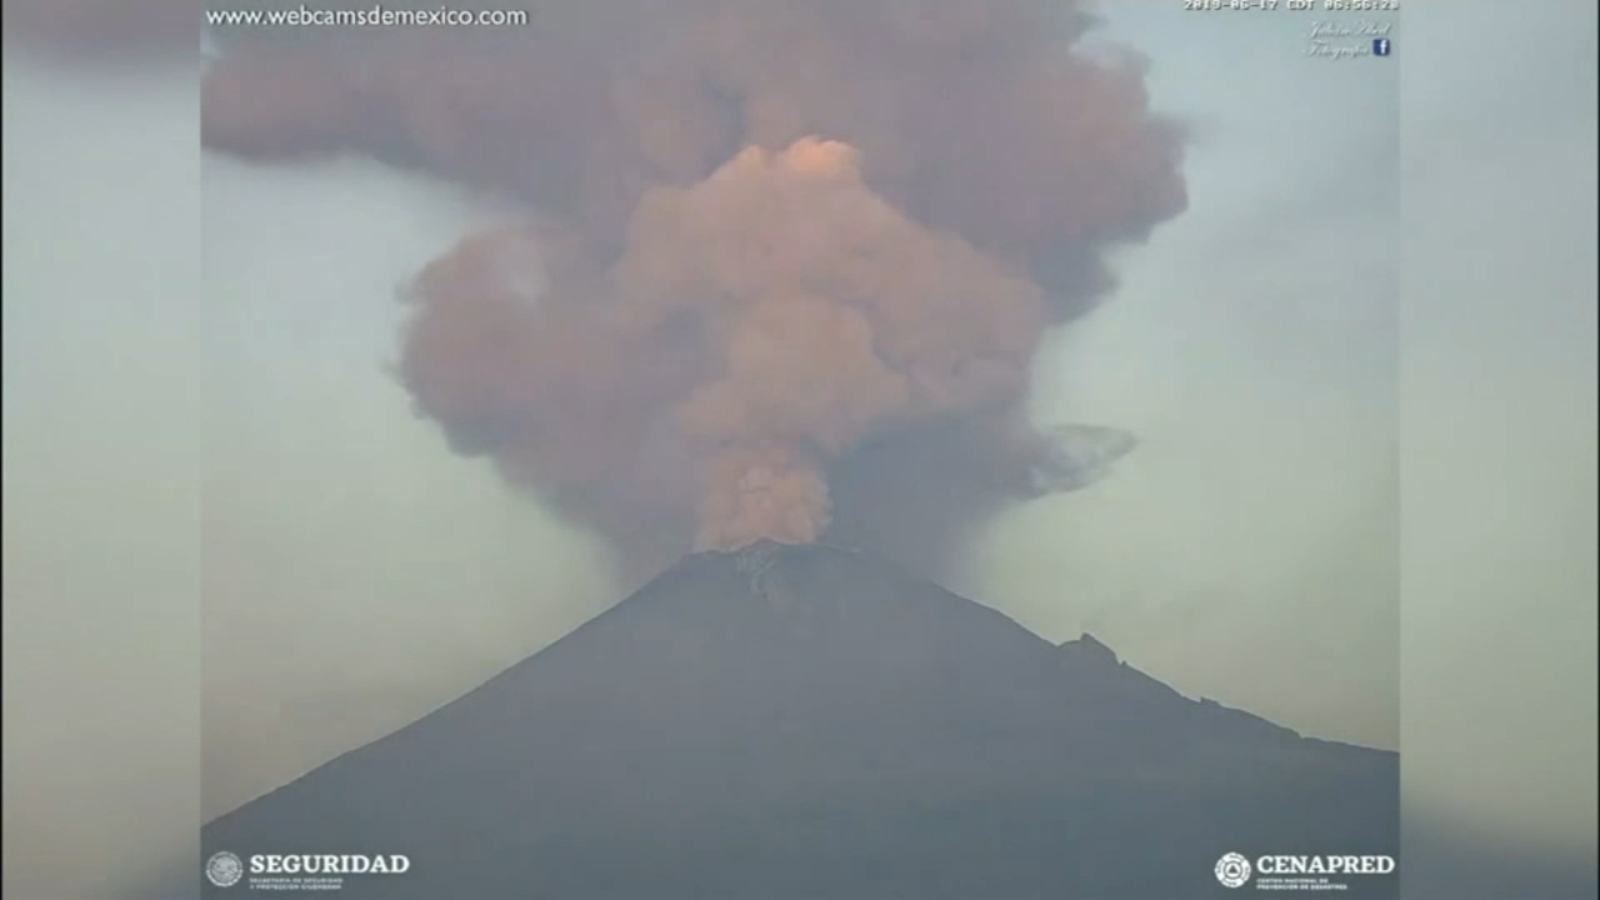 Mexico's Popocatepetl volcano erupts, spews gas, ash into the air